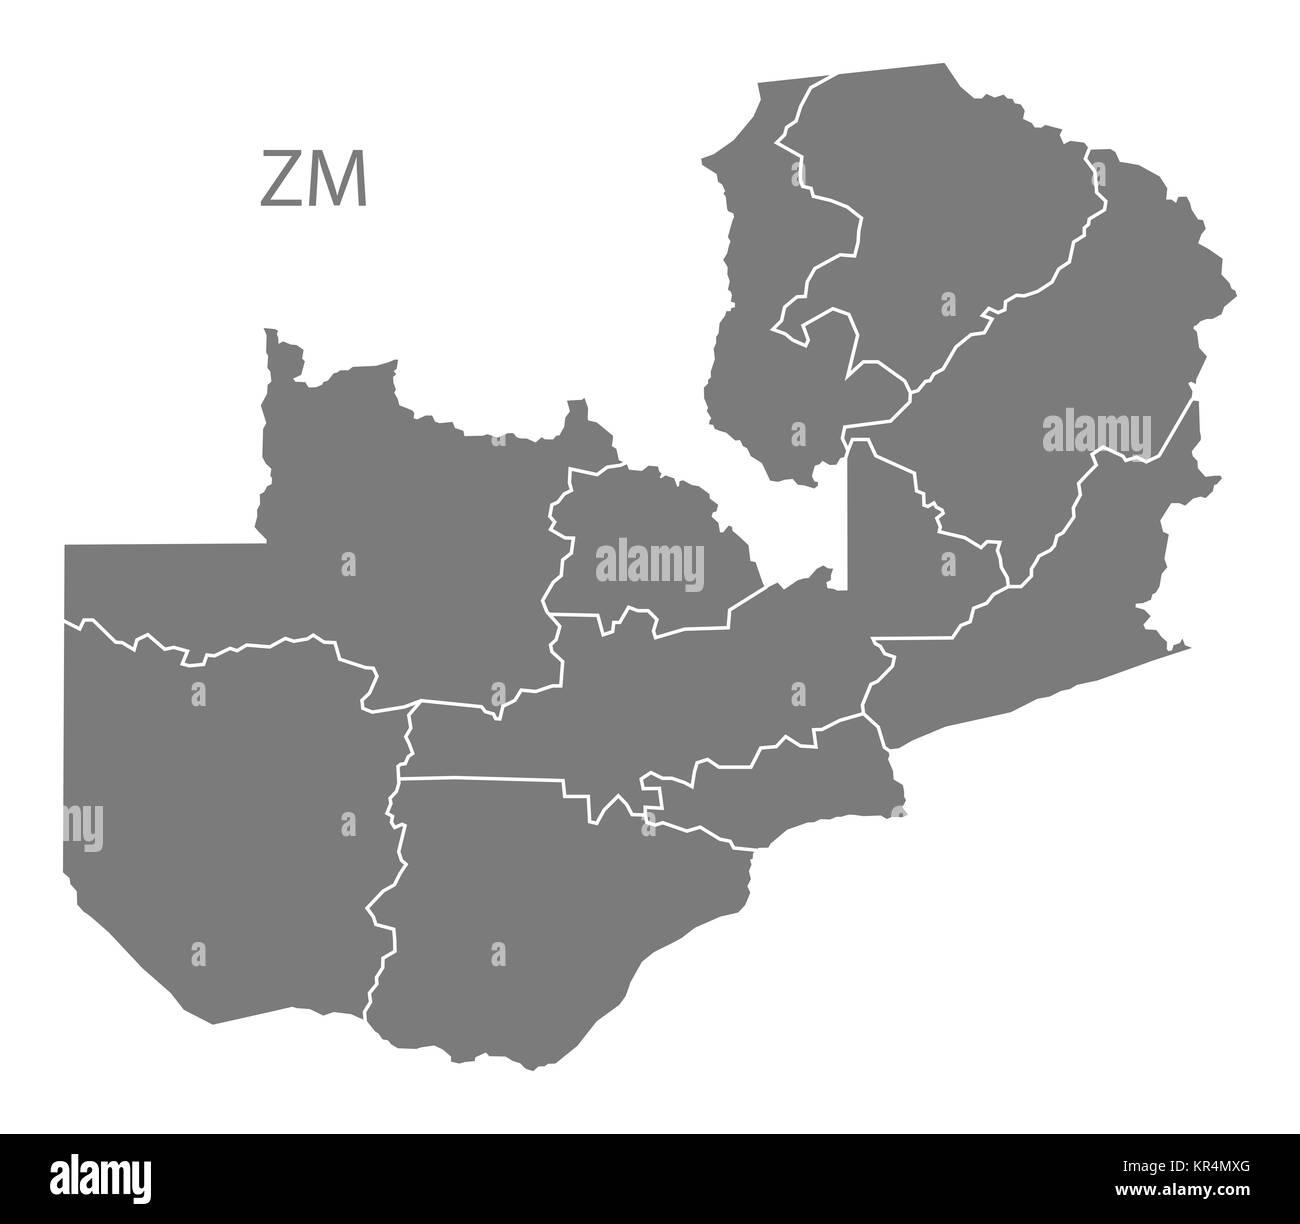 Zambia provinces Map grey Stock Photo: 169134632 - Alamy